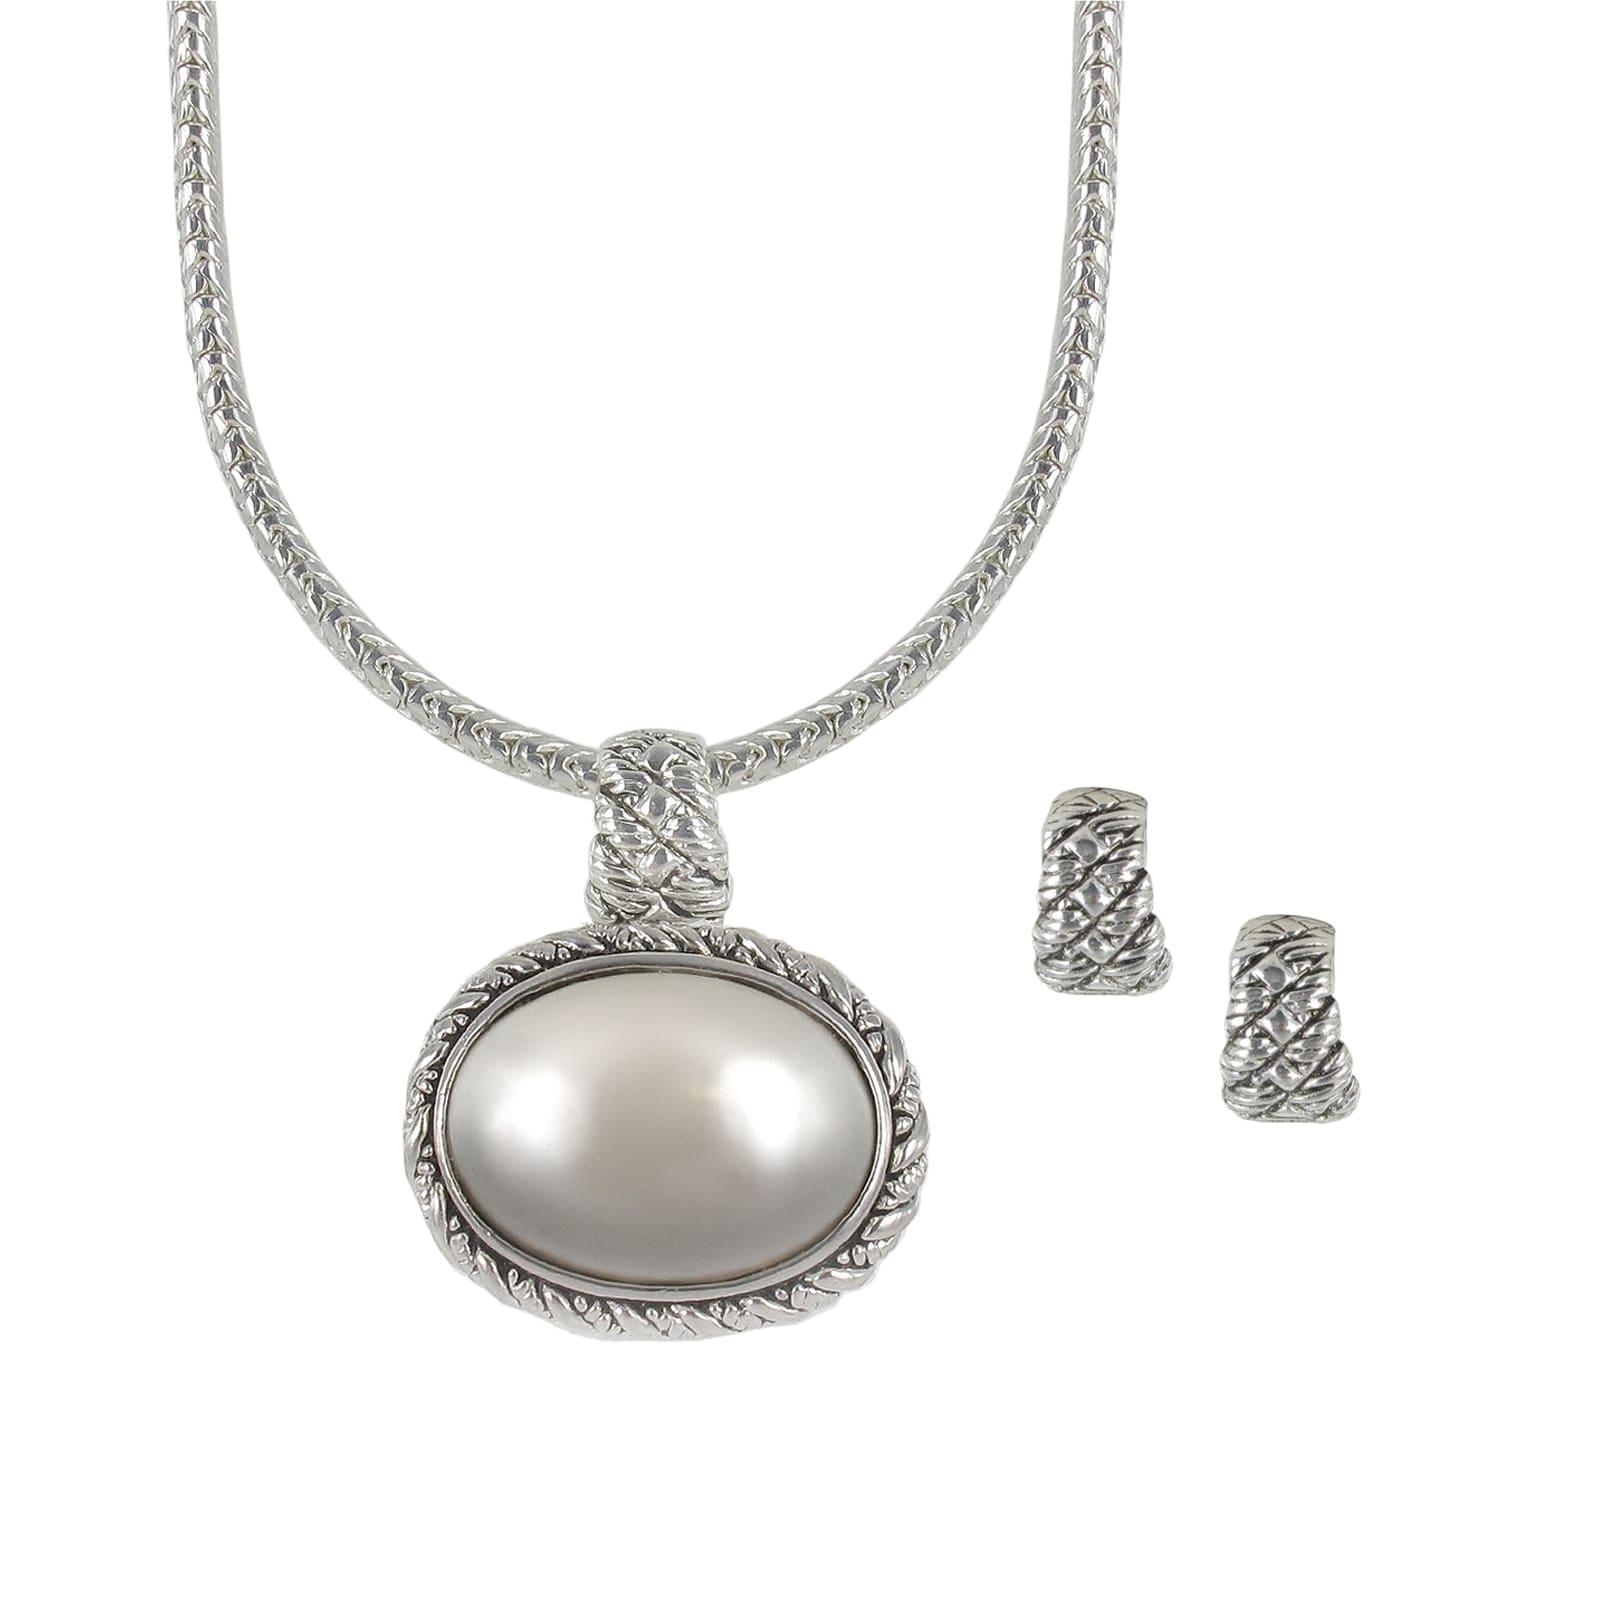 Roman Silvertone Oval Faux Pearl Artisan Jewelry Set